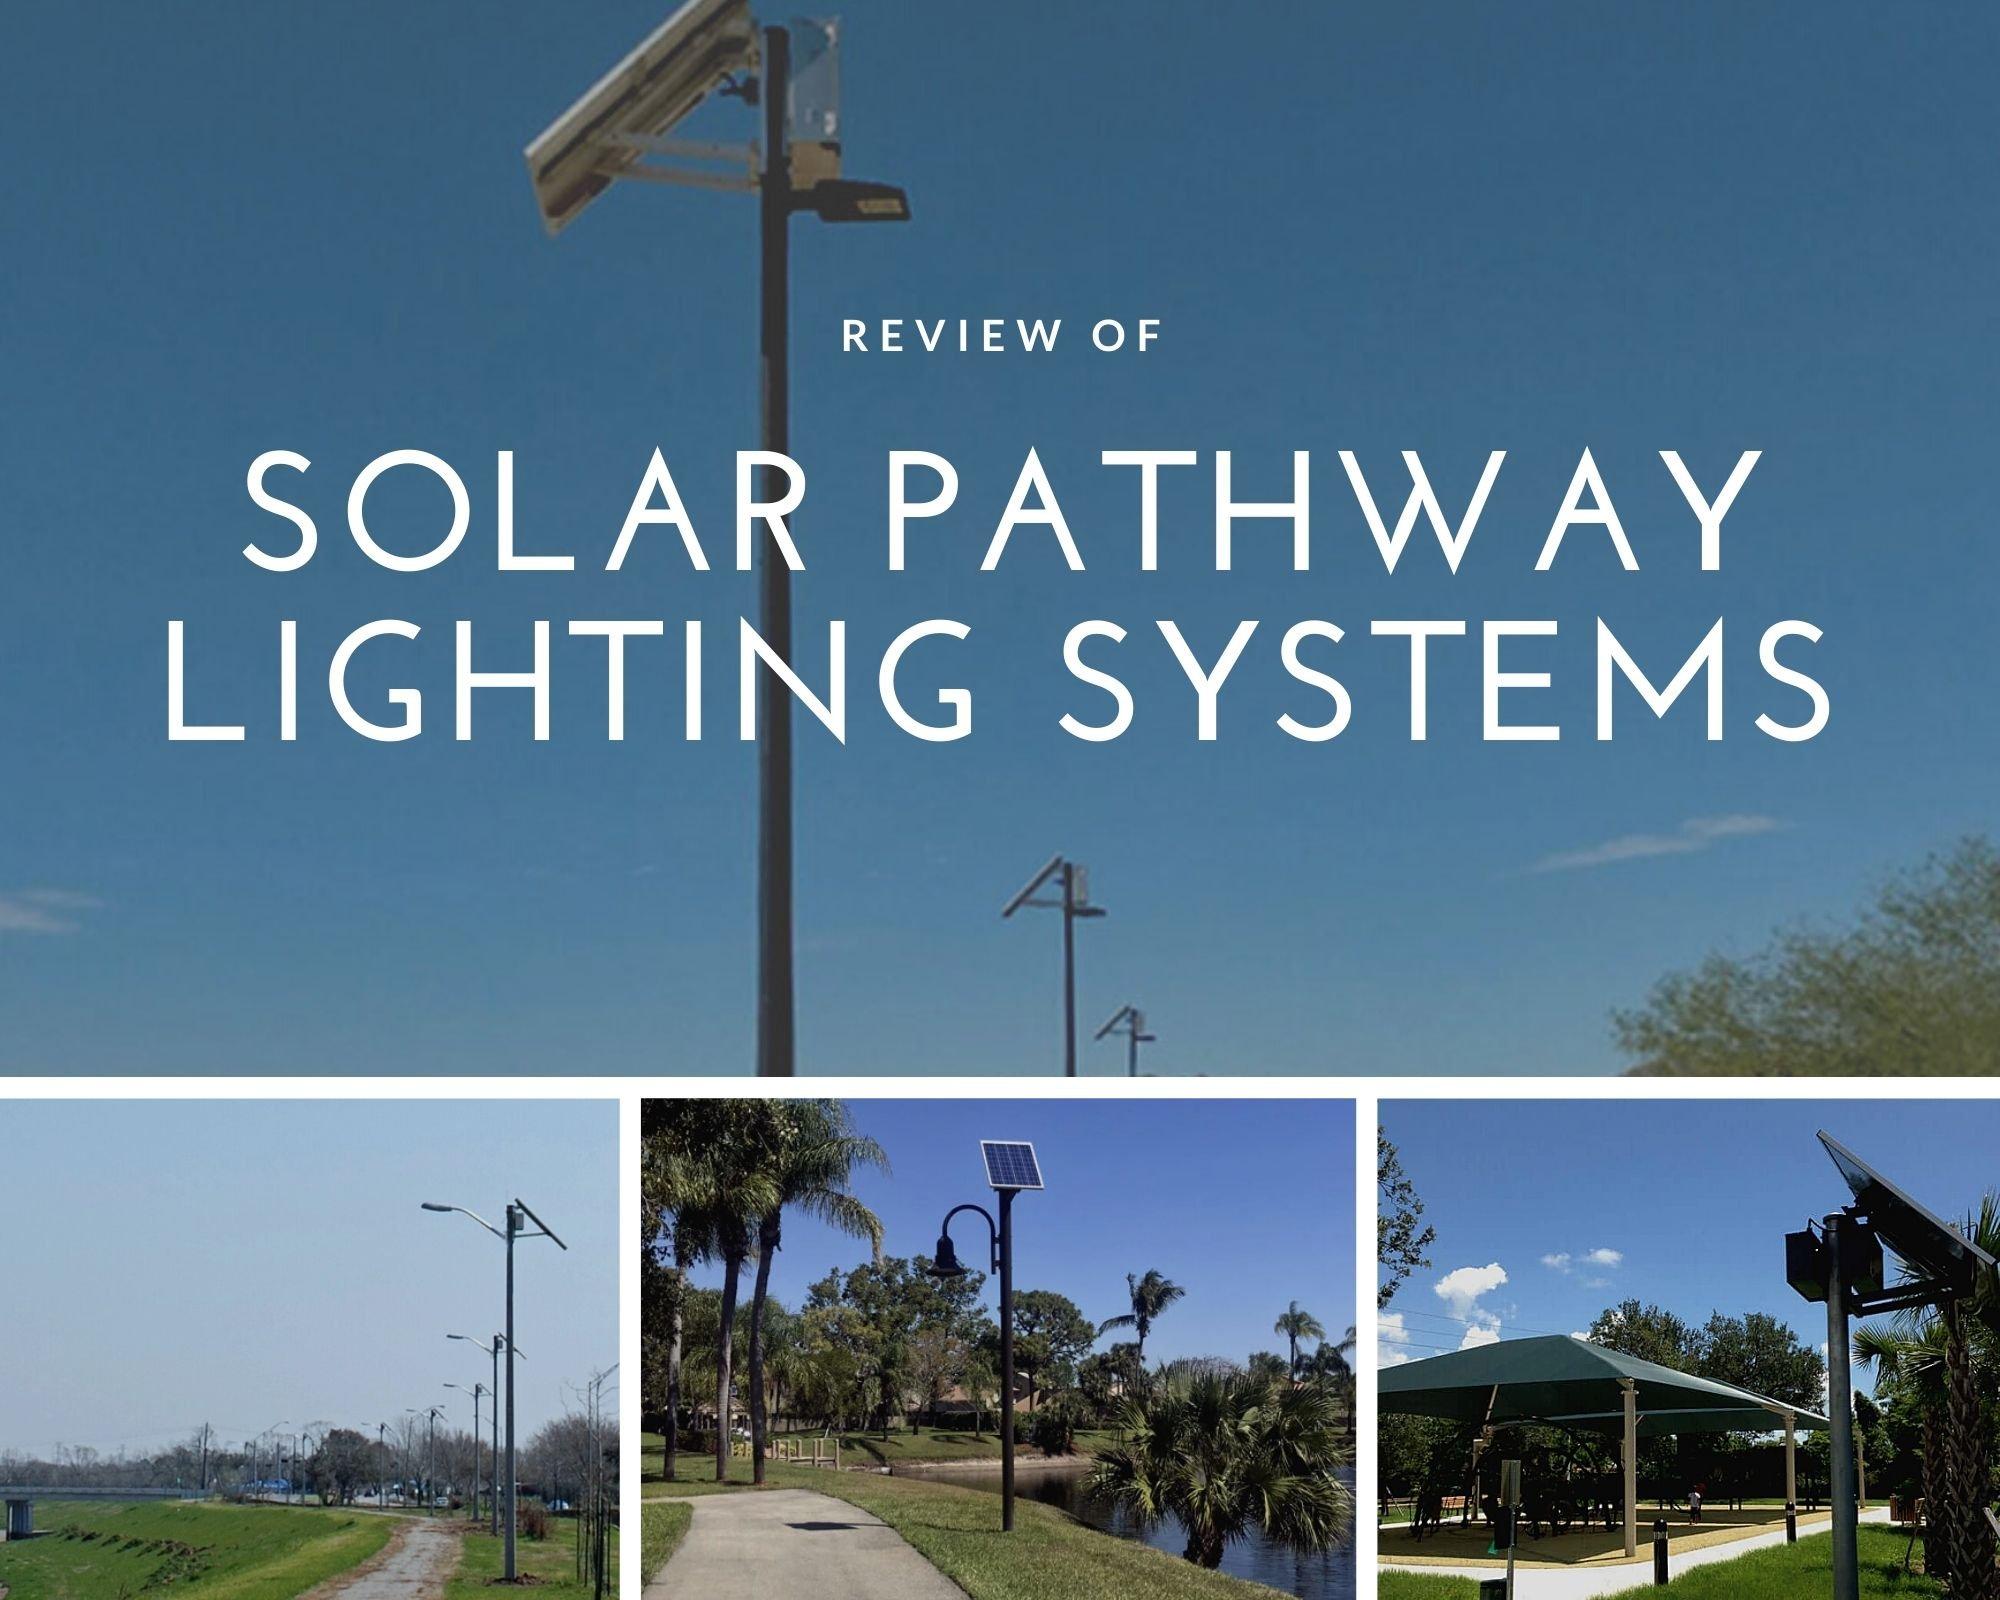 Solar Pathway Lighting Systems